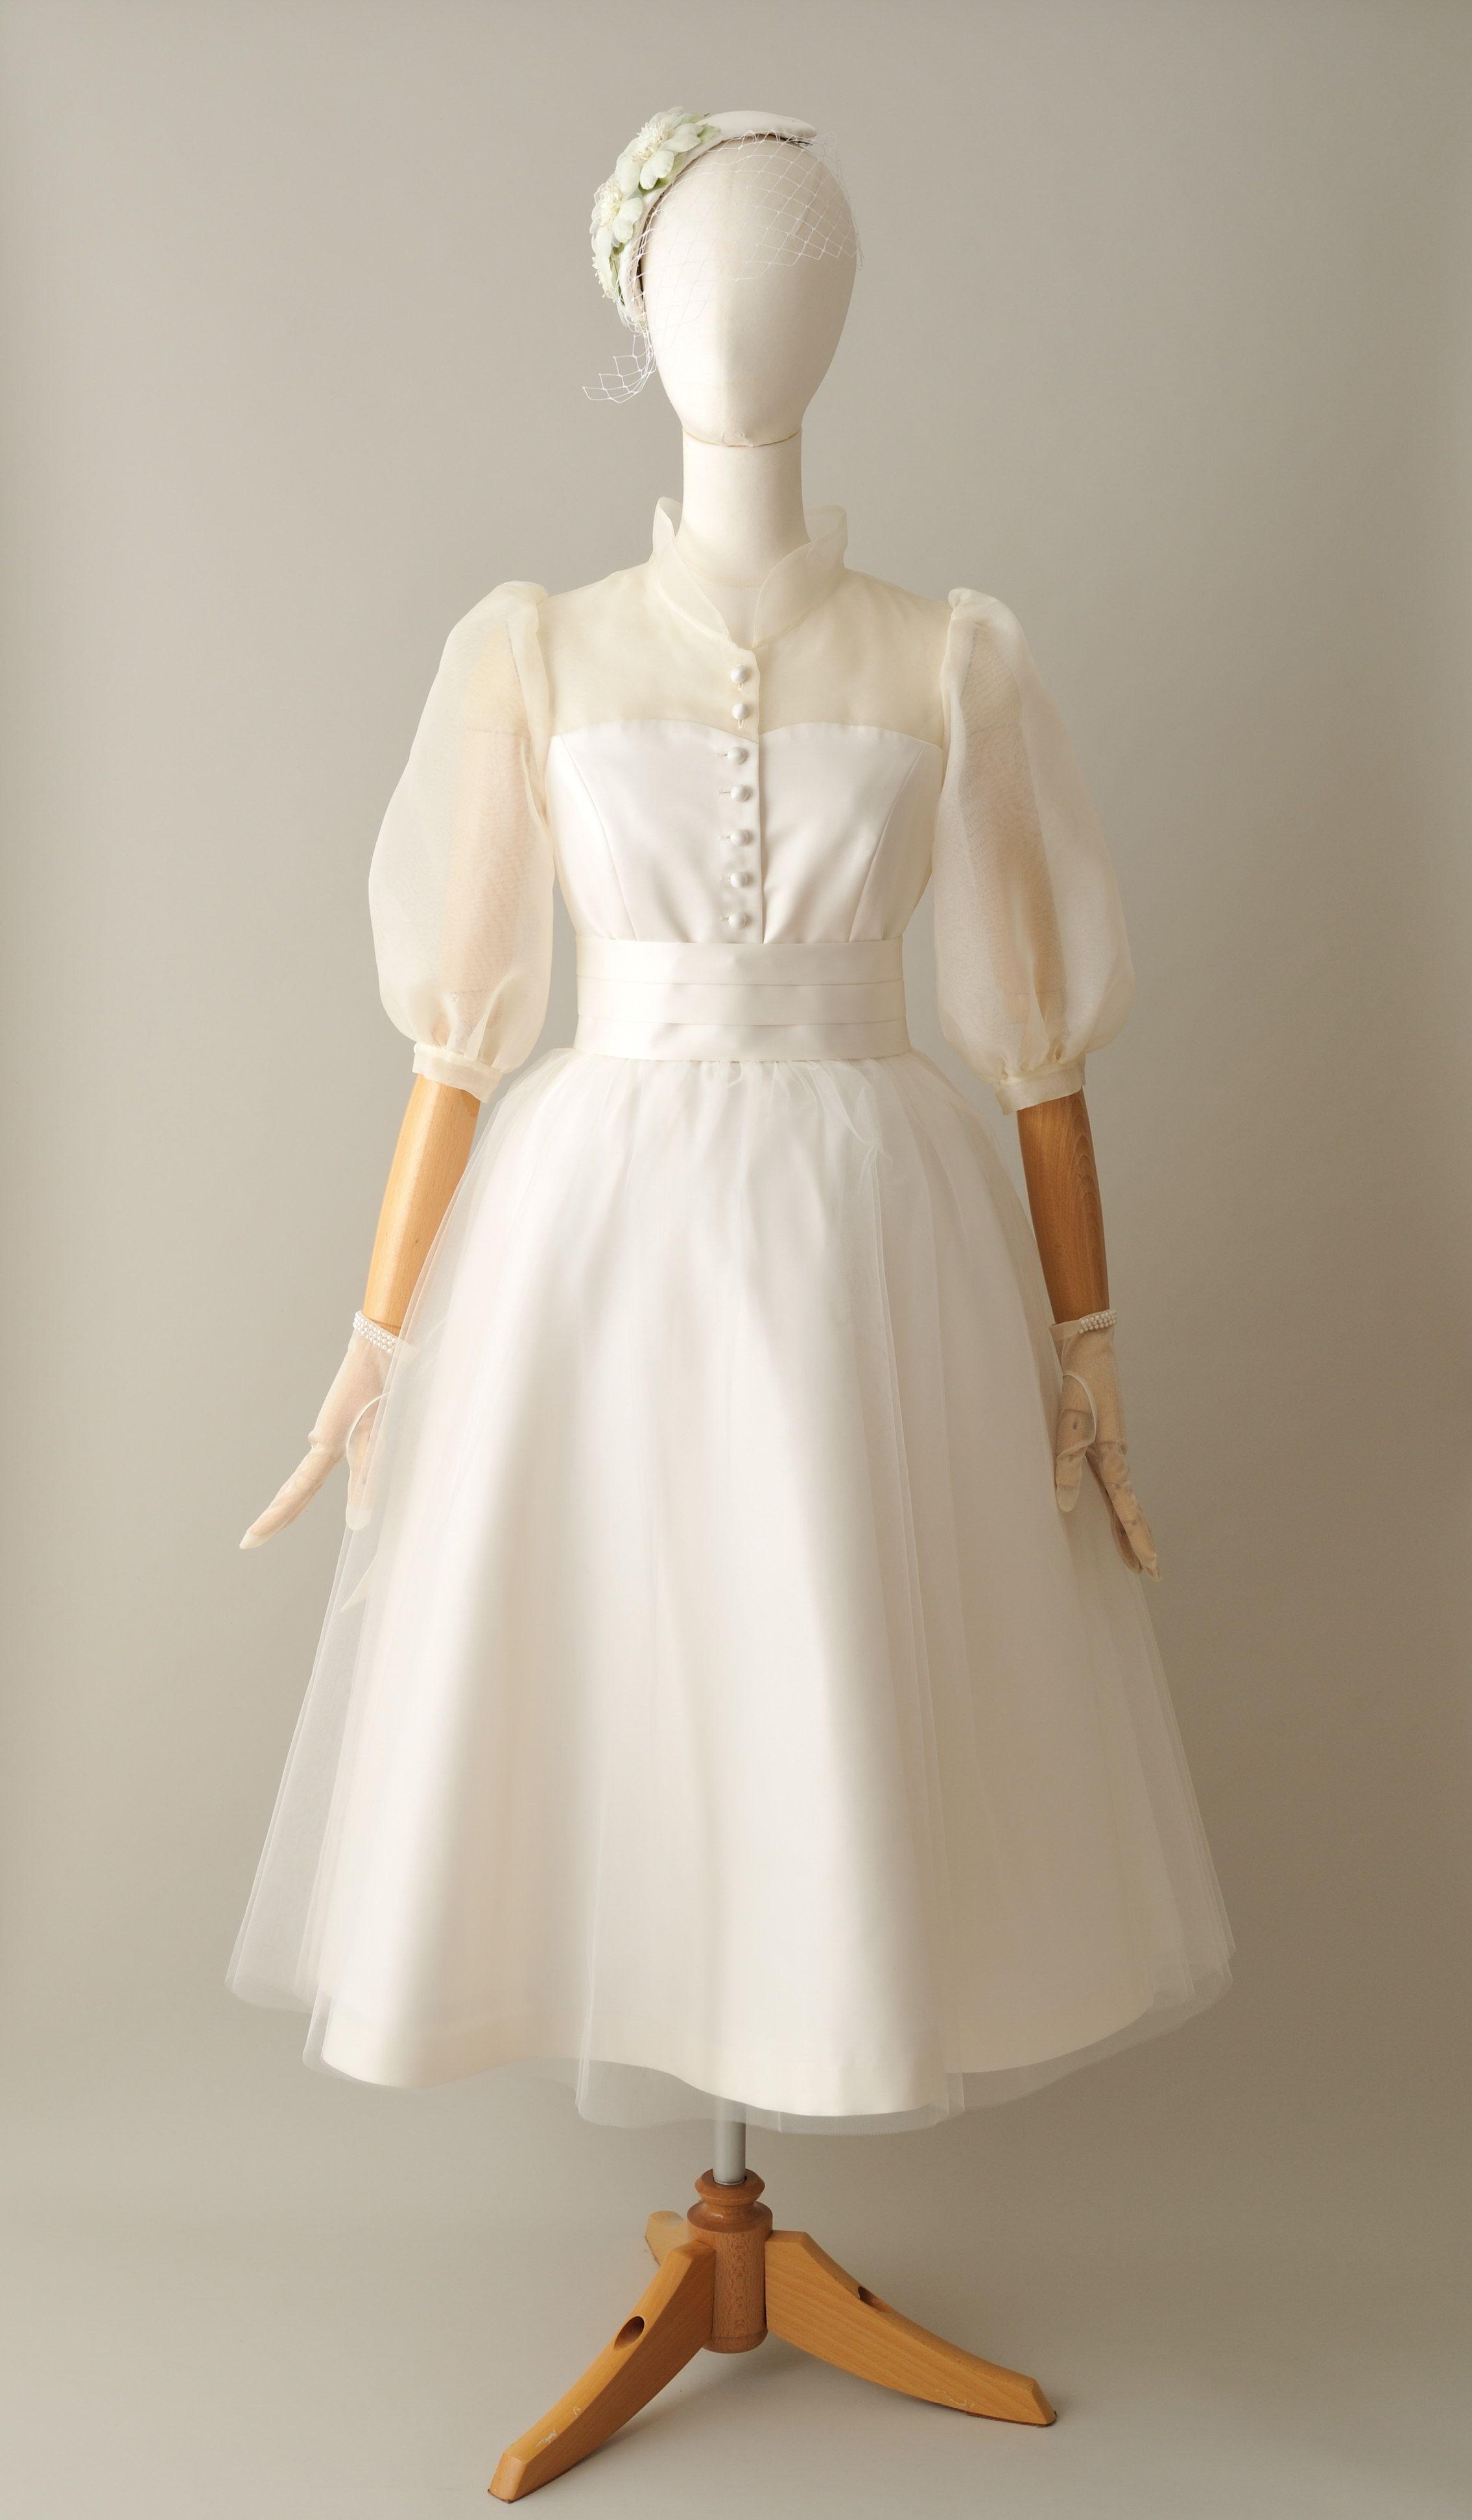 23035b480d9ba オードリー・ヘップバーンをイメージしたウェディングドレス